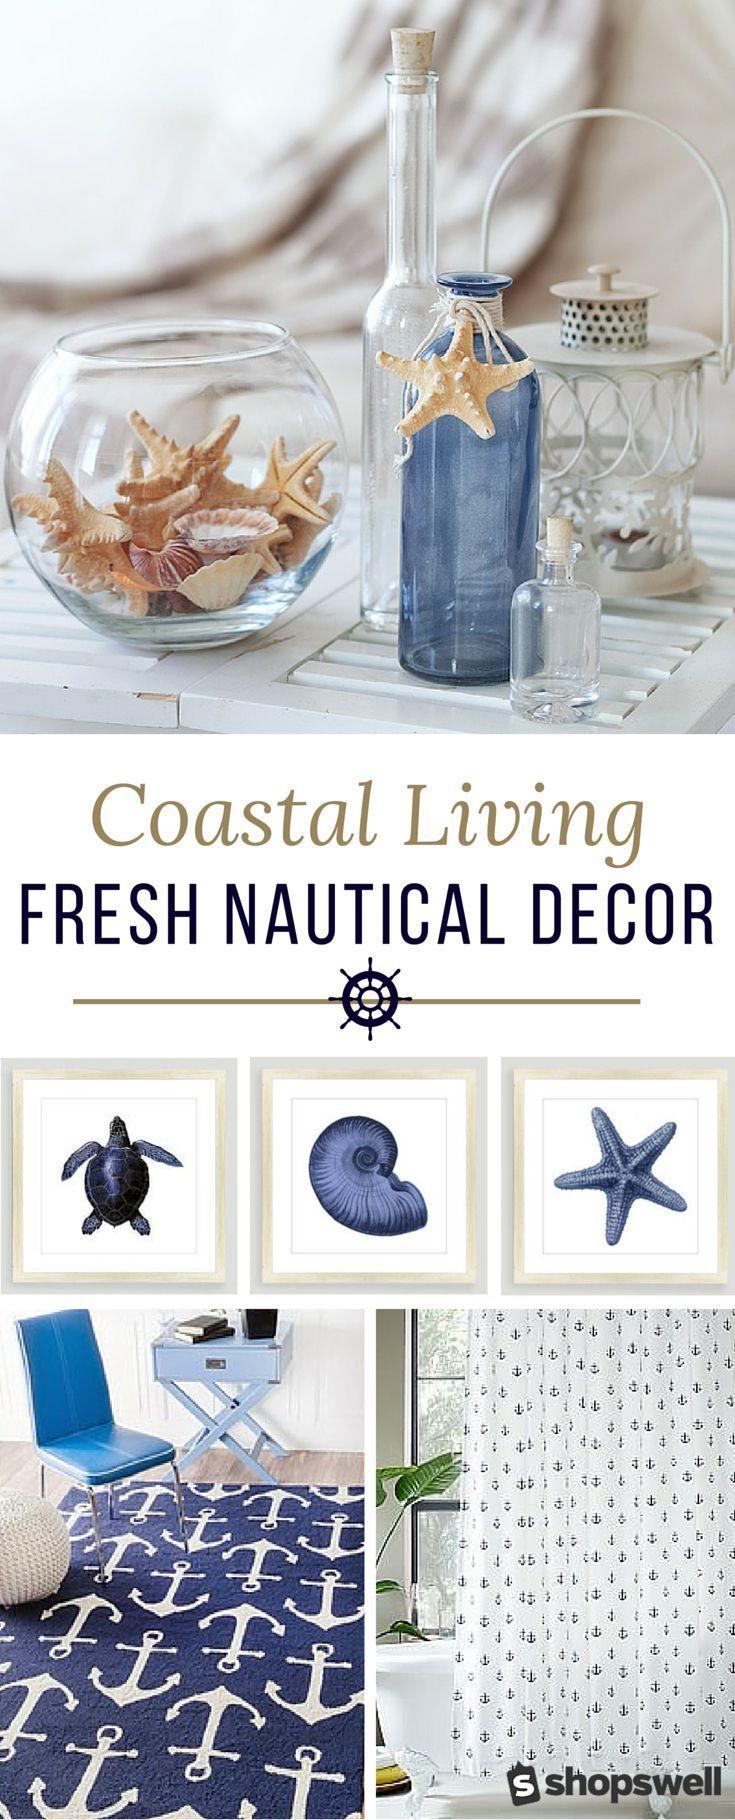 best beach dorm images on pinterest good ideas home ideas and